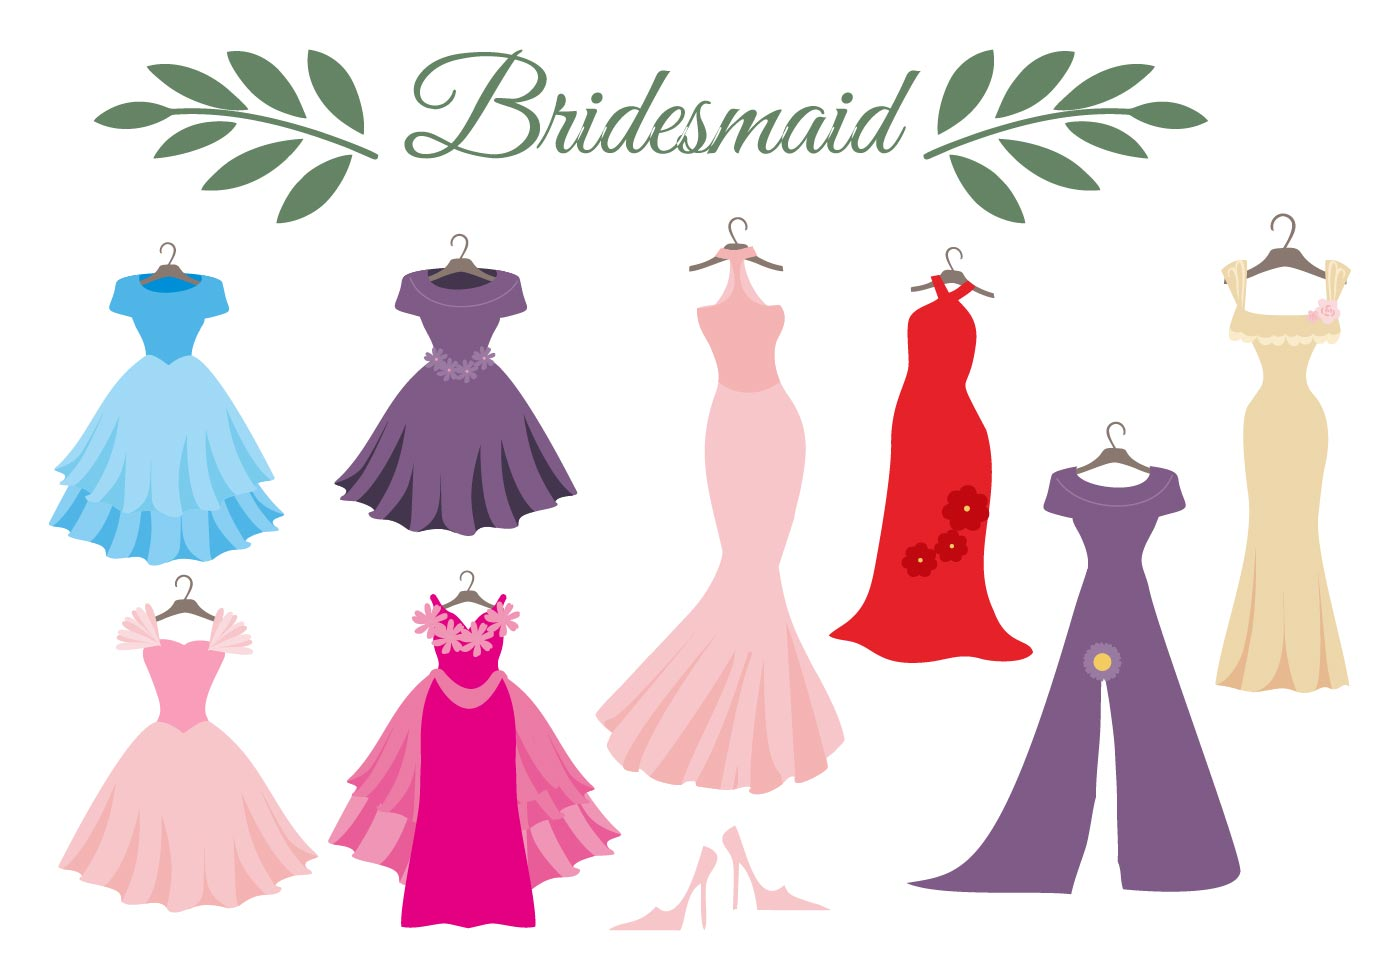 1400x980 Free Wedding Dress Bridesmaid Vector